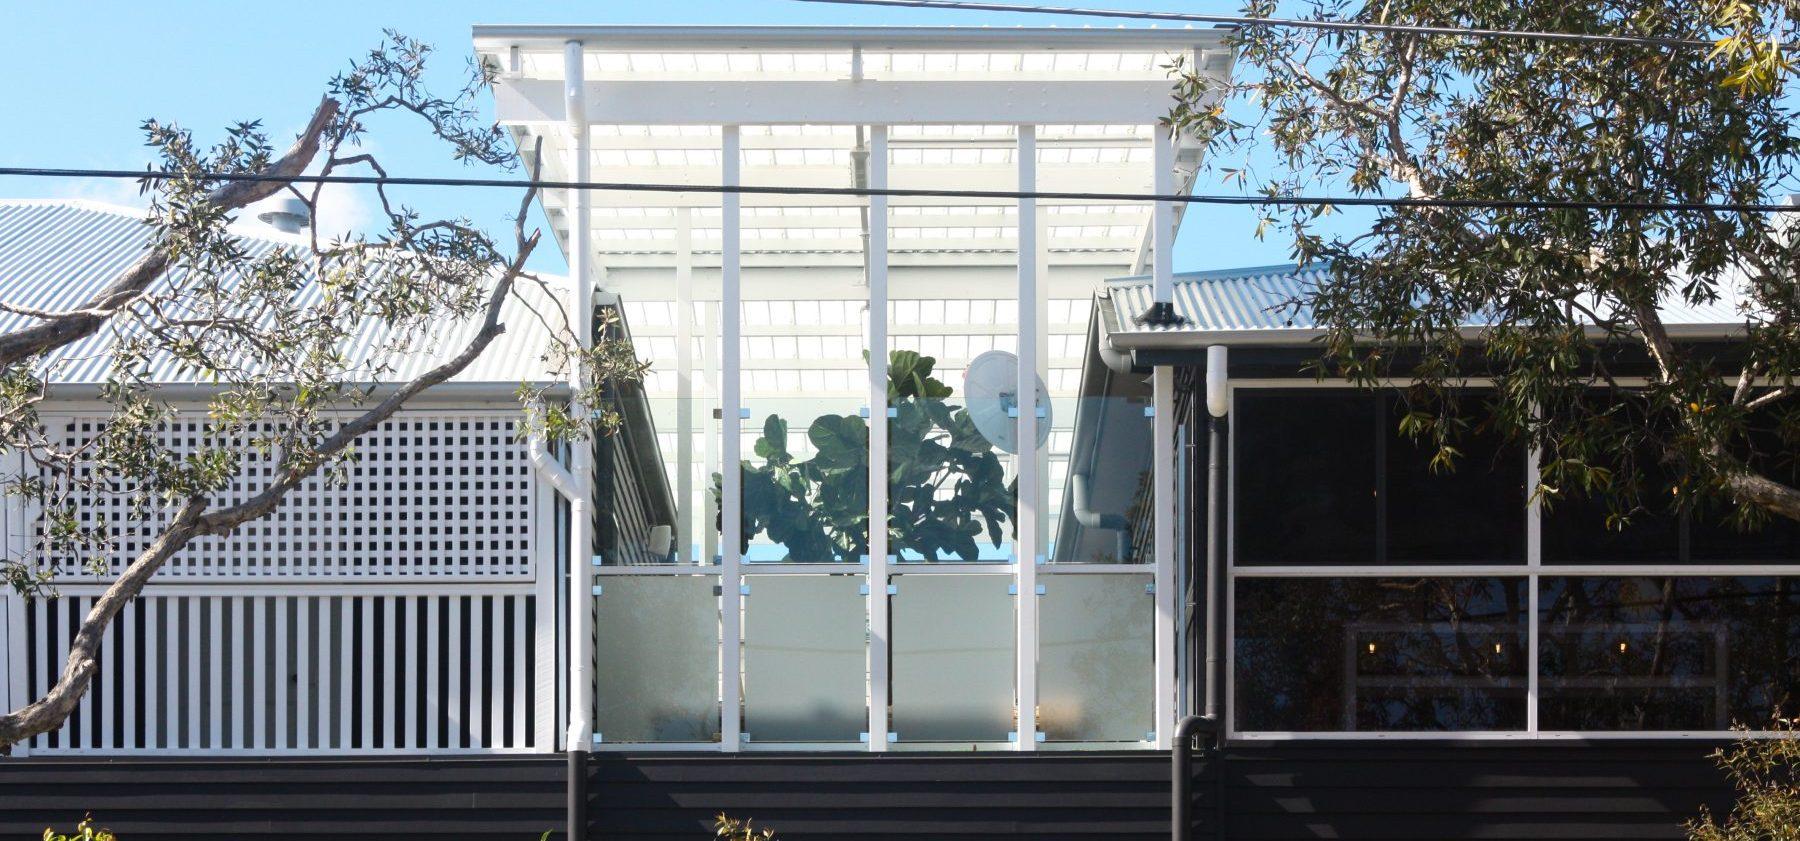 Harmony Balmoral Exterior Walkway